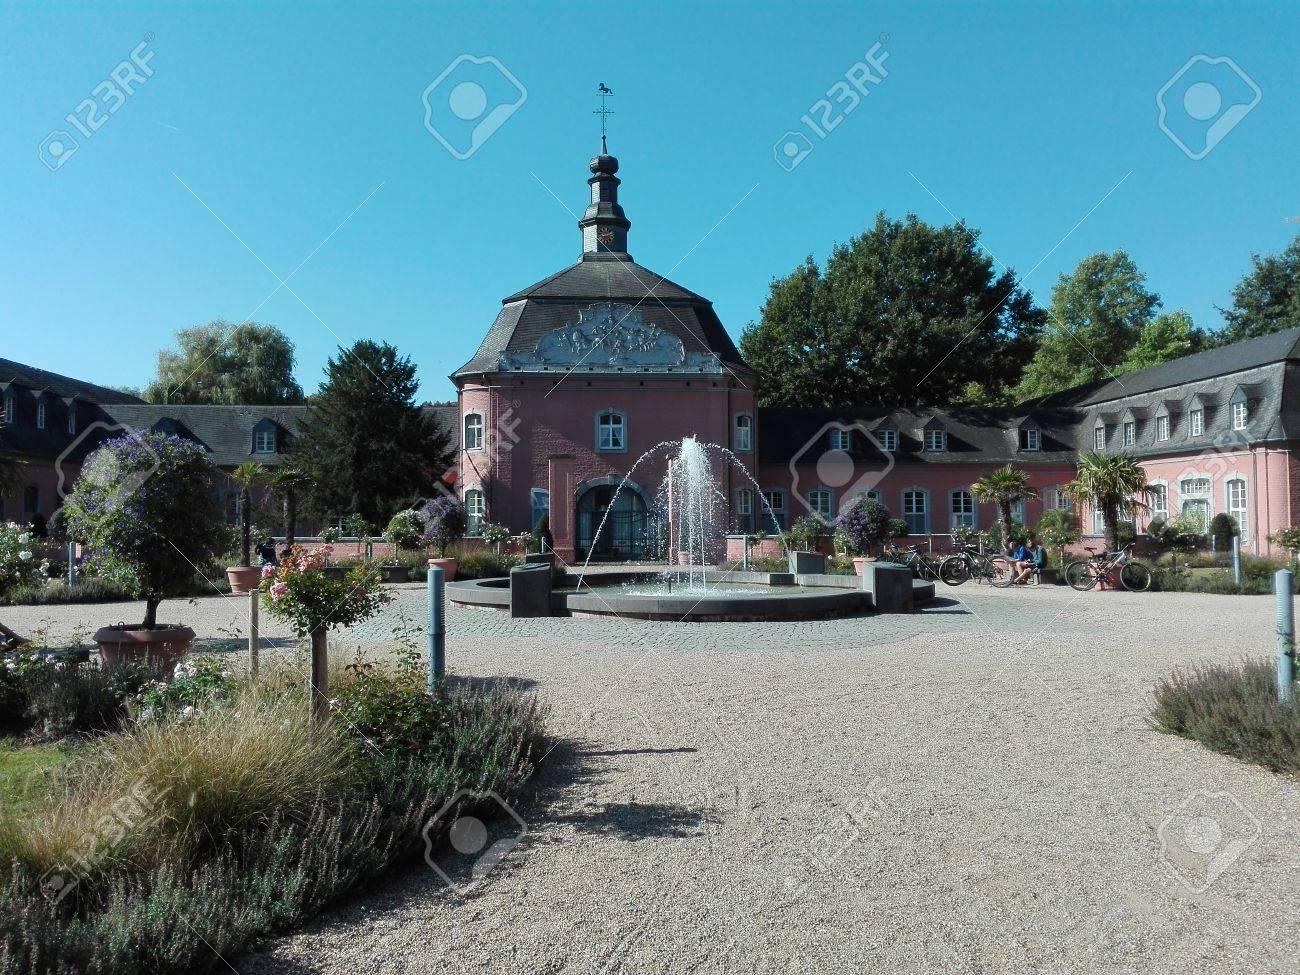 Castle Wickrath - Building of the castle of Castle Wickrath, Germany, Wickrath 10/12/2016 - 68769722